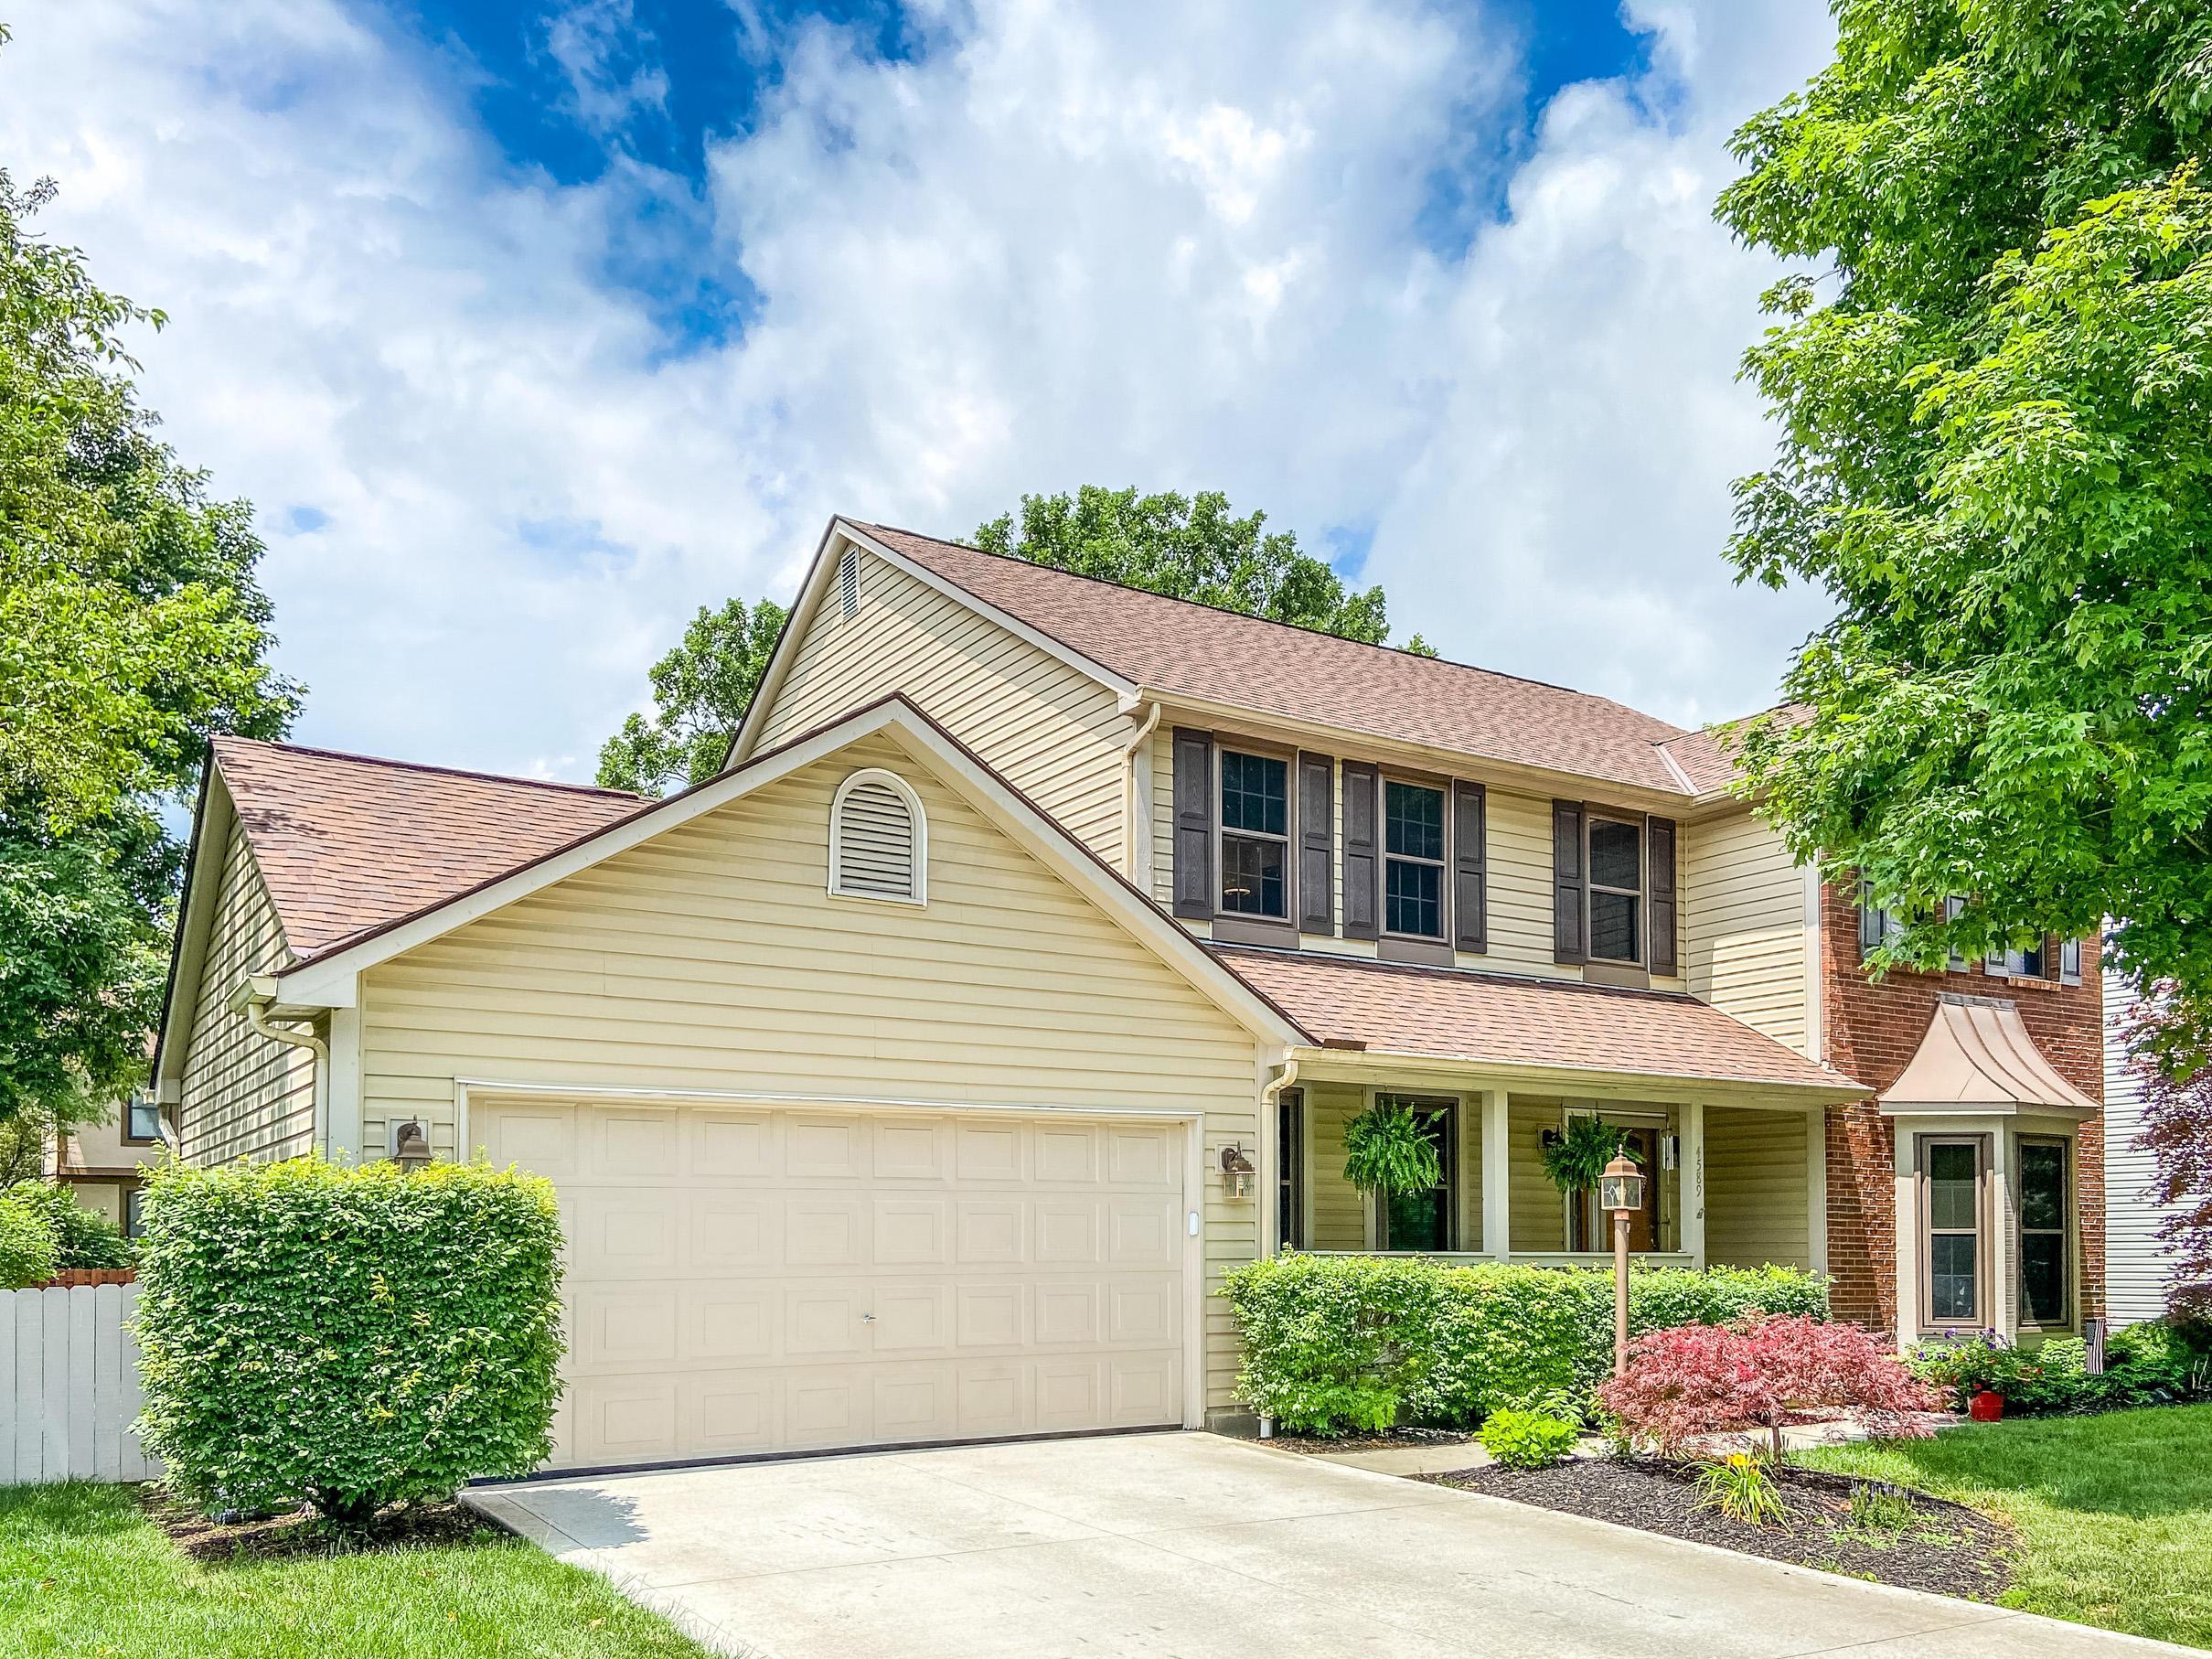 4589 Stonehill Street, Hilliard, Ohio 43026, 4 Bedrooms Bedrooms, ,3 BathroomsBathrooms,Residential,For Sale,Stonehill,220019910